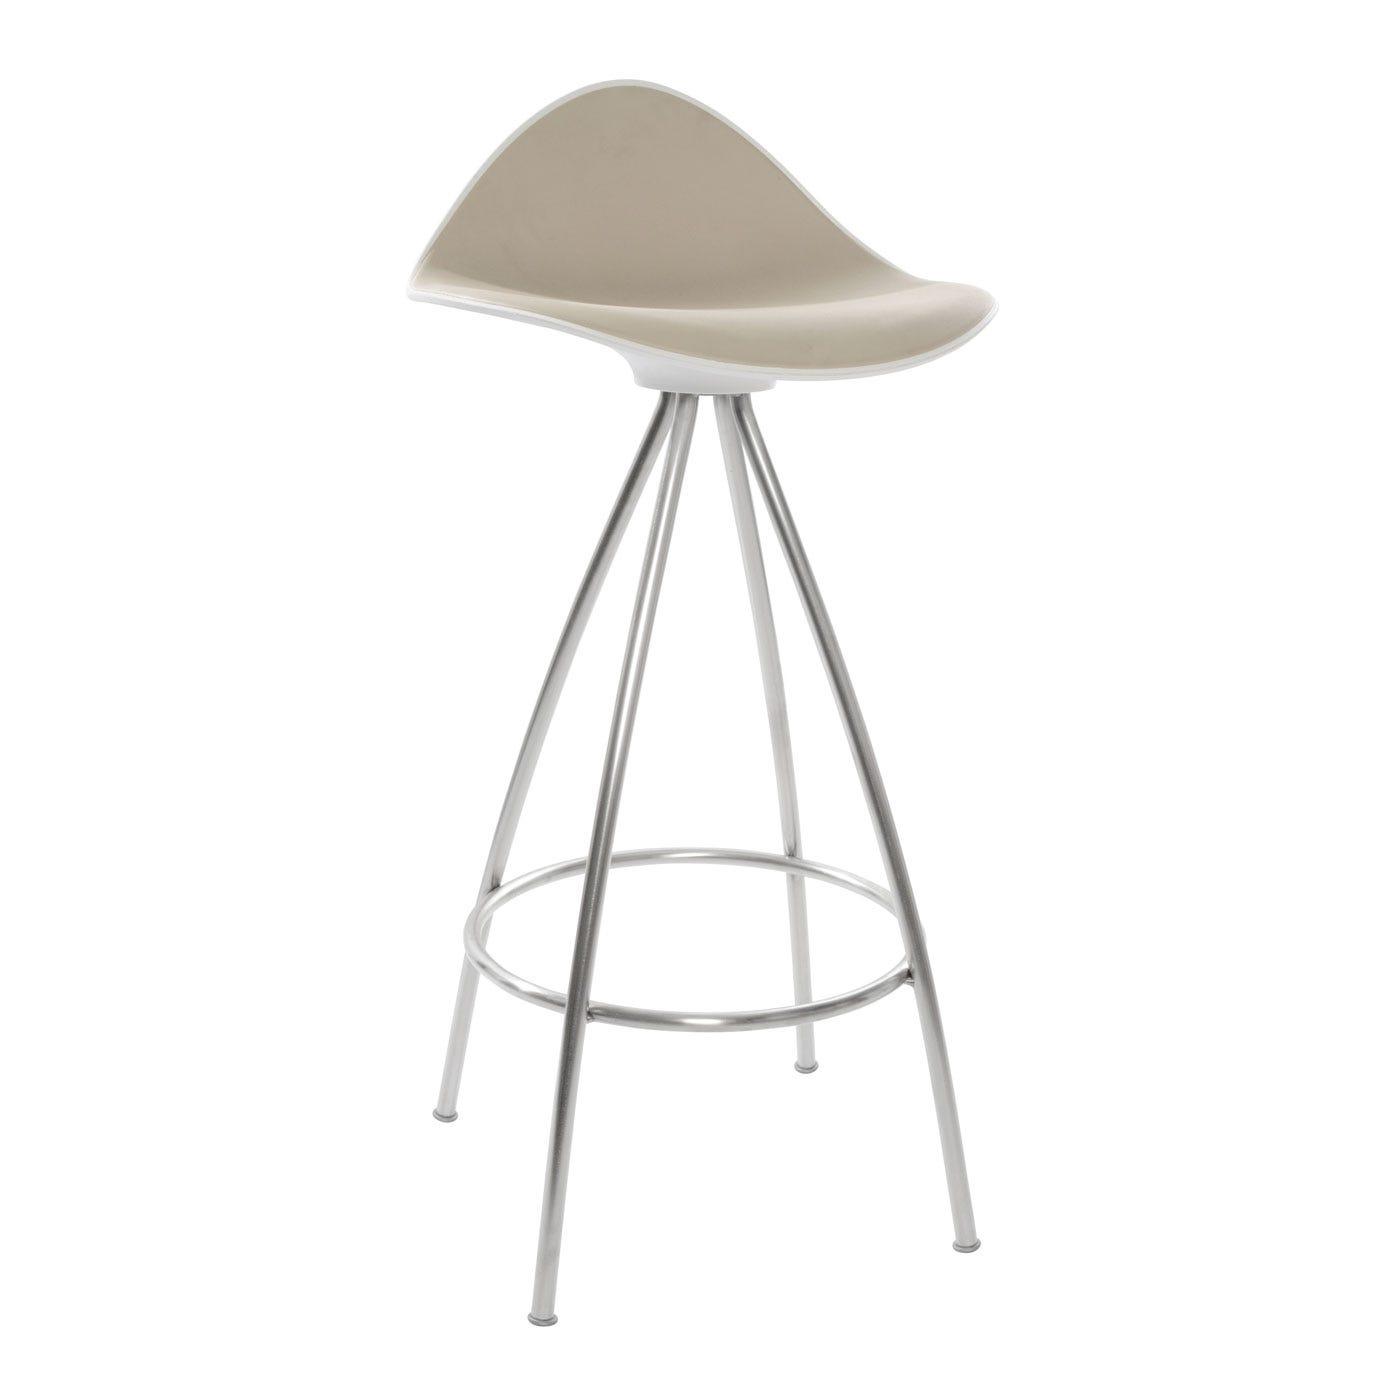 Heal 39 s onda stool - Onda counter stool ...